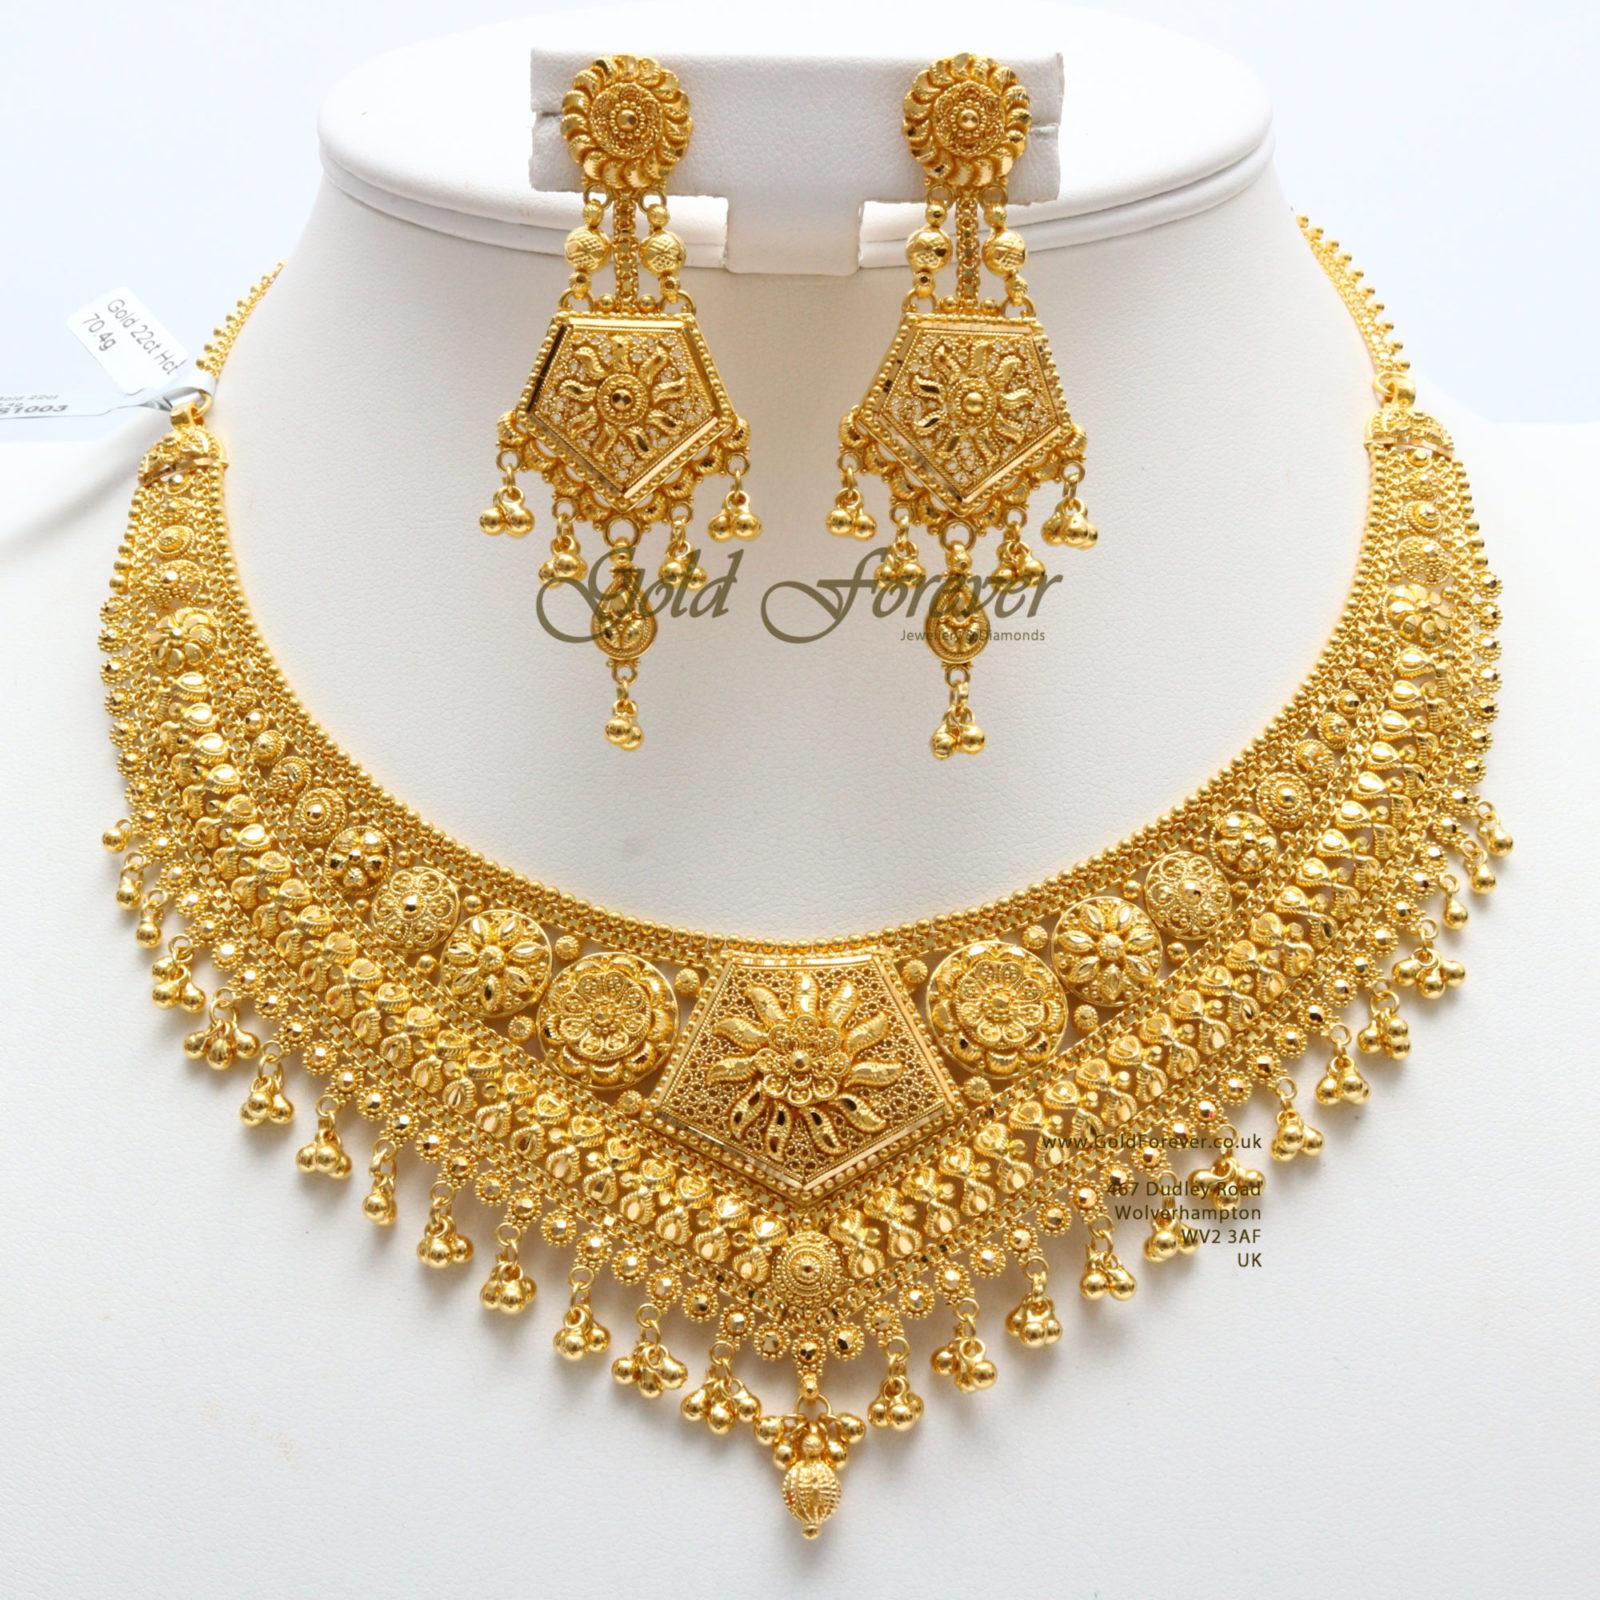 22 Carat Indian Gold Necklace Set 70 4 Grams Code Ns1003 Gold